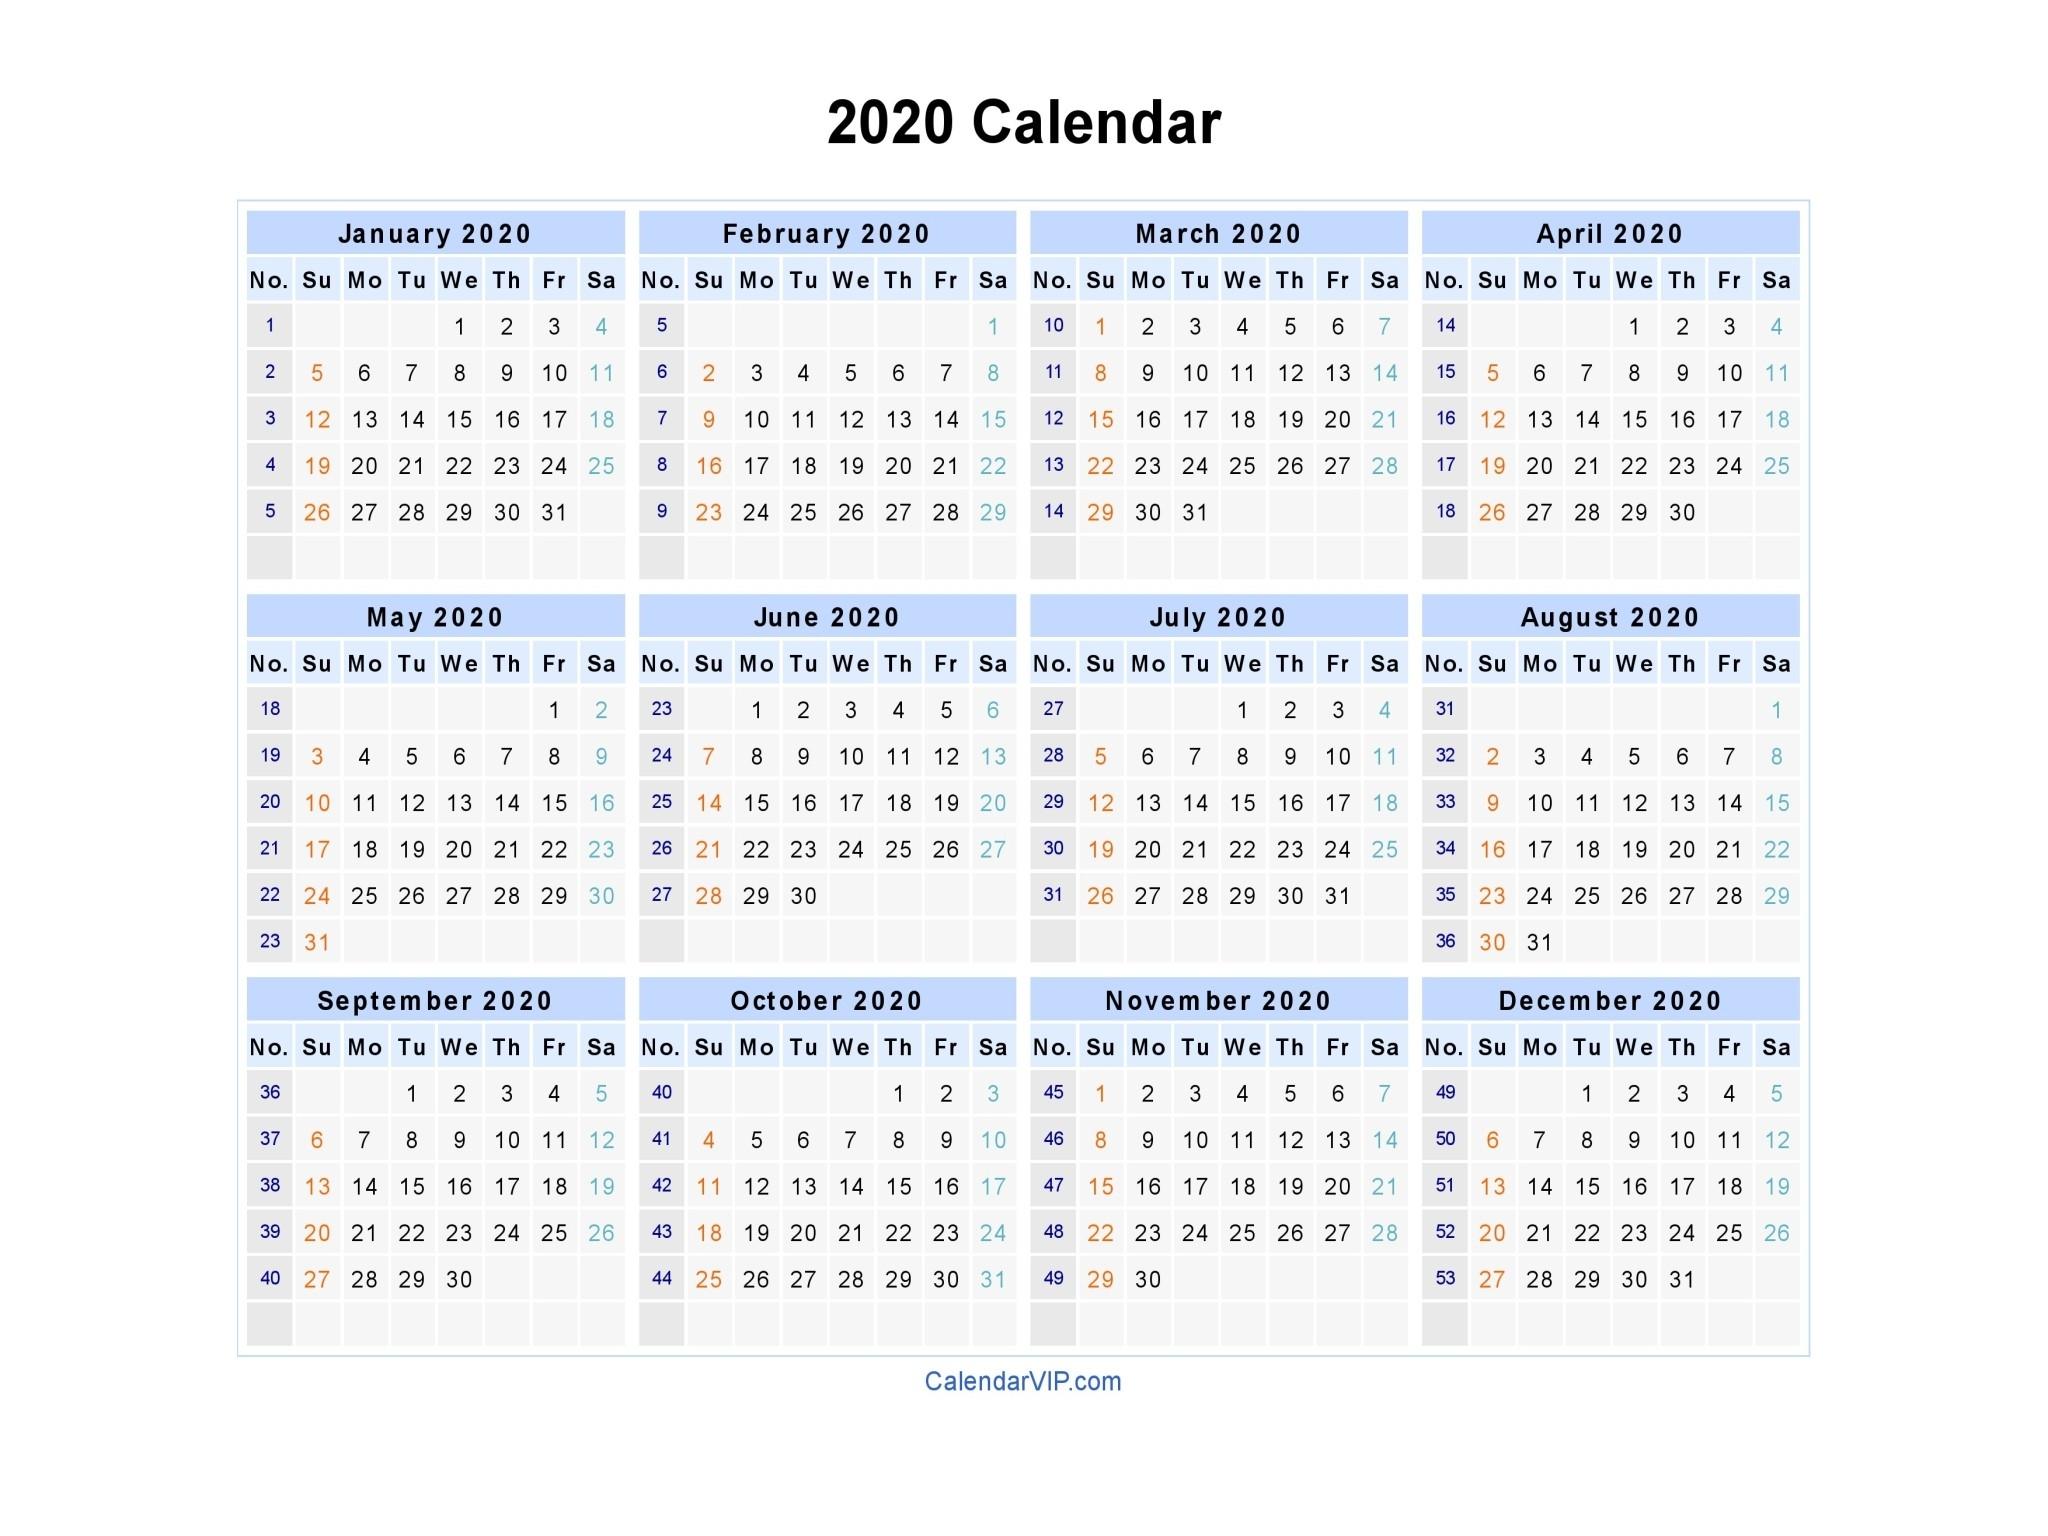 2020 Calendar - Blank Printable Calendar Template In Pdf-2020 Calendar Template Ms Word